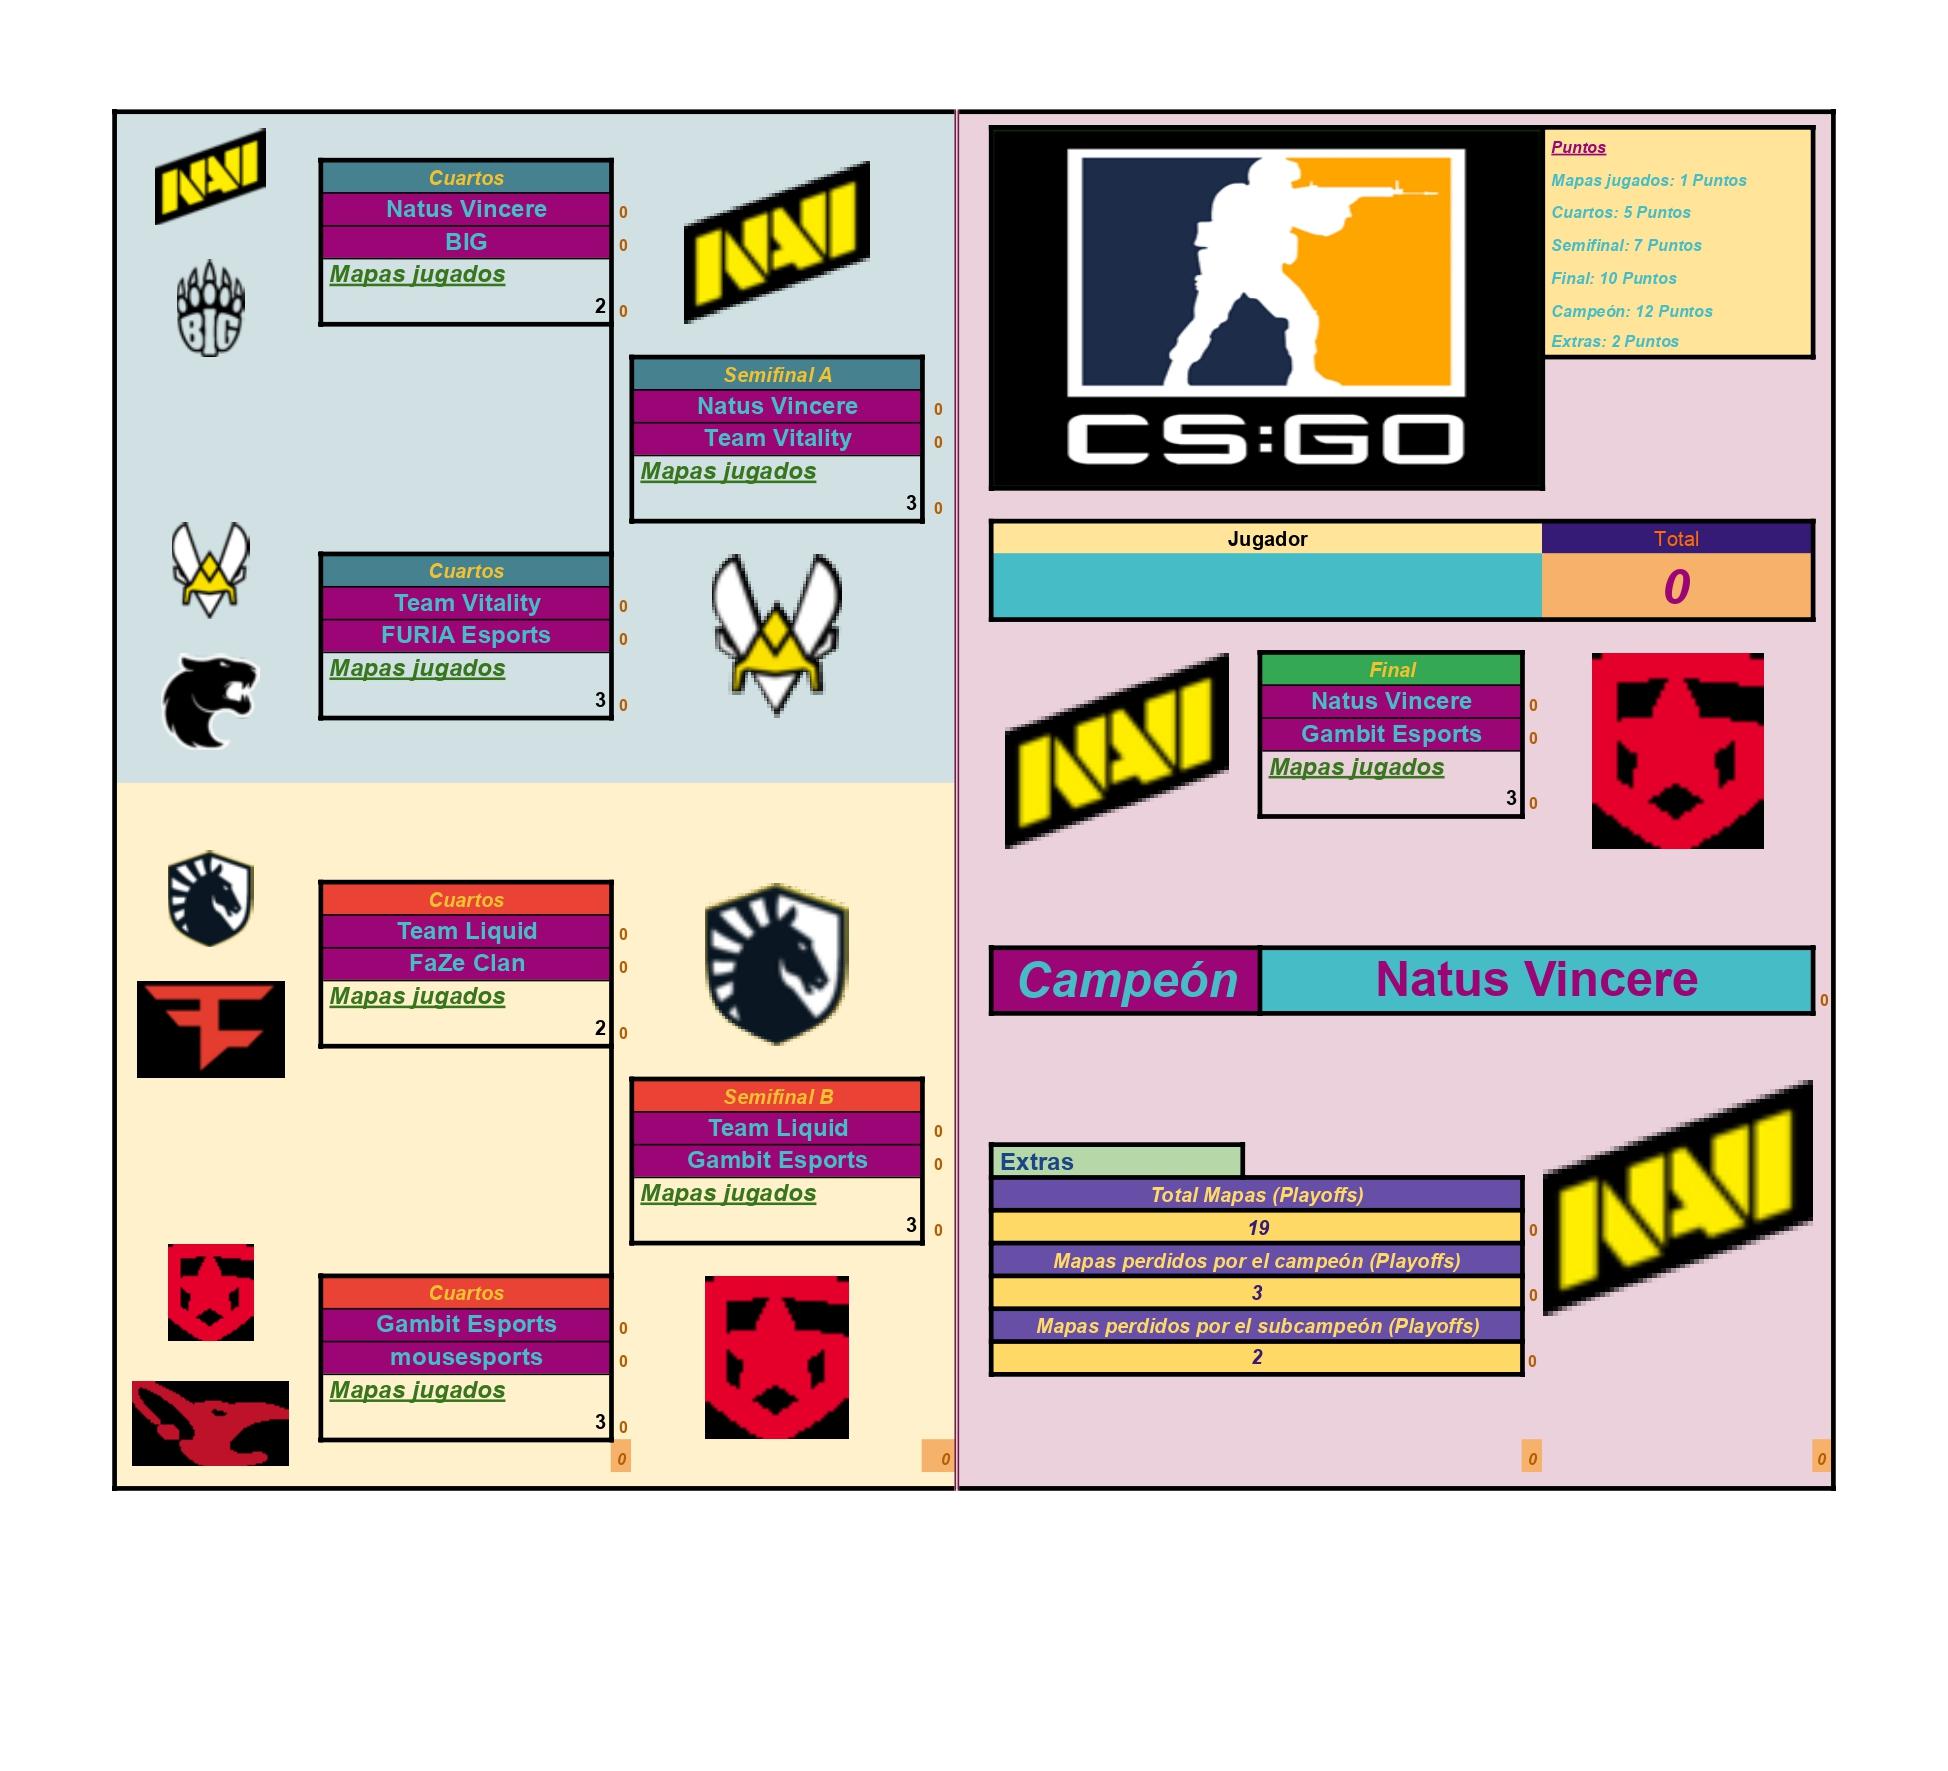 Excel Pickem CS:GO Major PGL